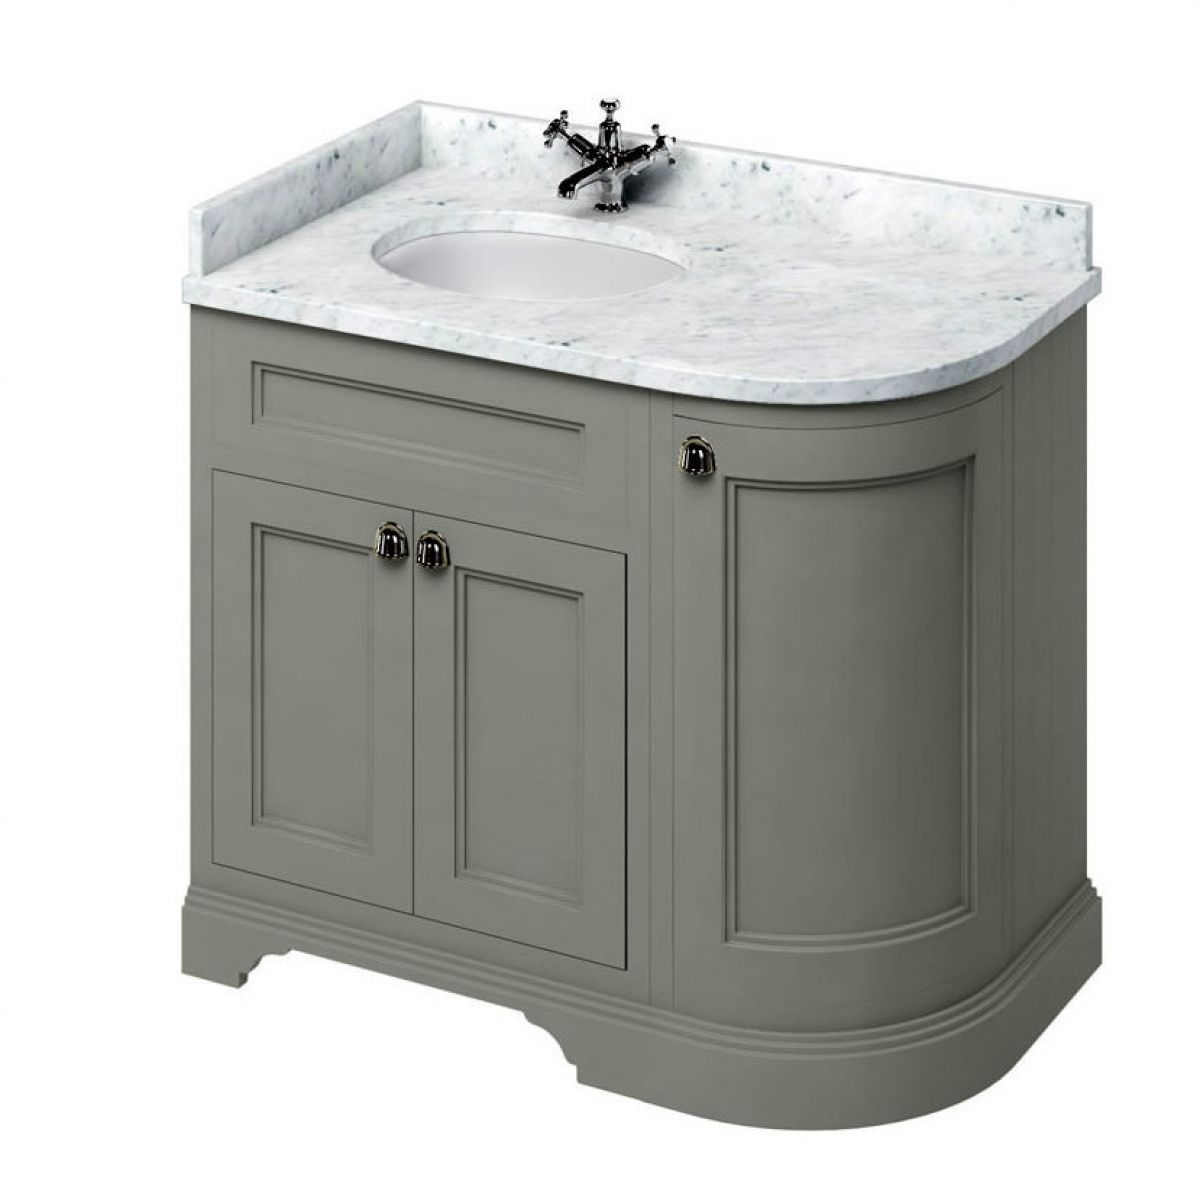 Burlington 100 Curved Vanity Unit Uk Bathrooms For Proportions 1200 X 1200 Bathroom Vanity Unit Workt Sink Vanity Unit Black Marble Bathroom Corner Vanity Unit